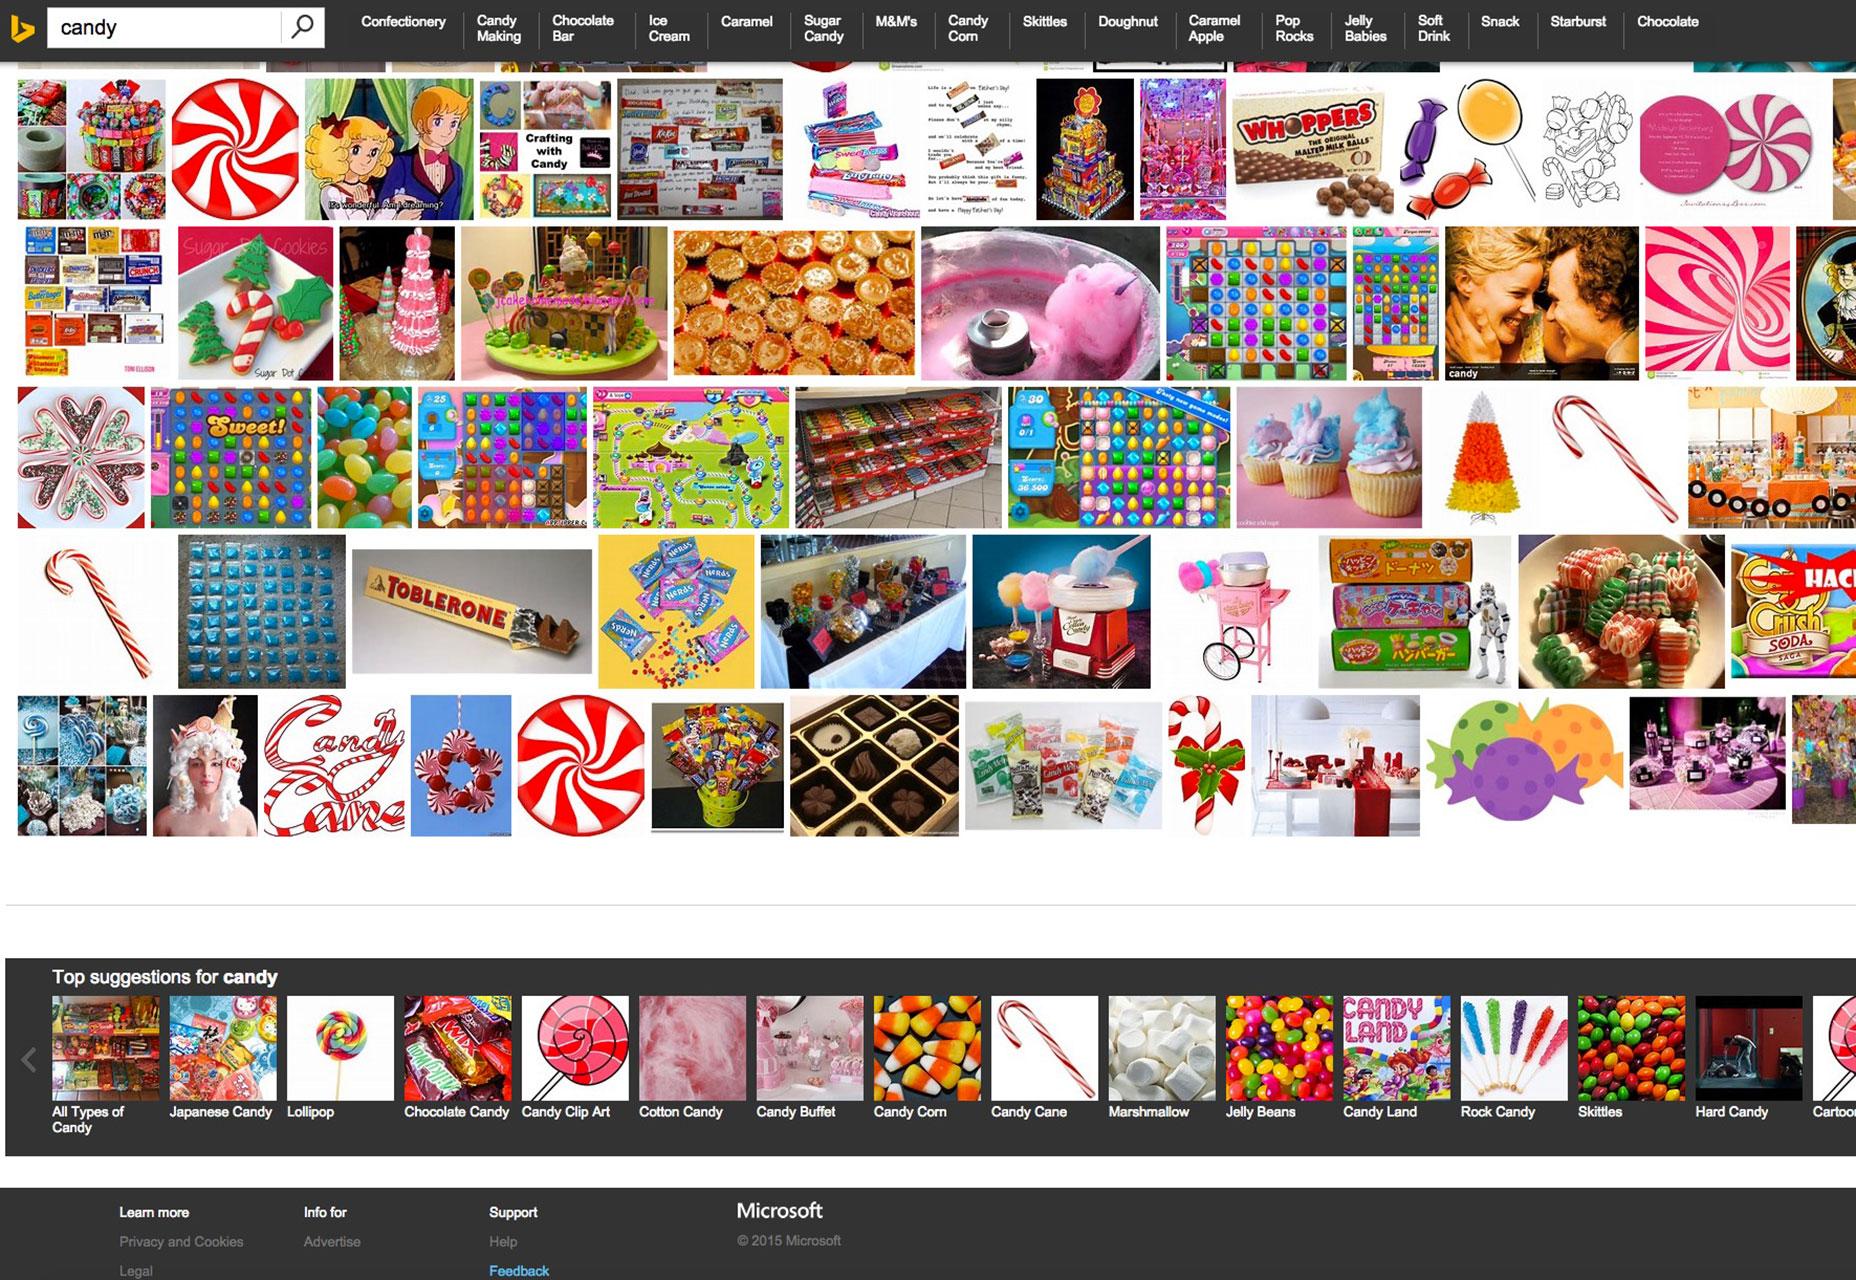 Bing-Images-Screenshot